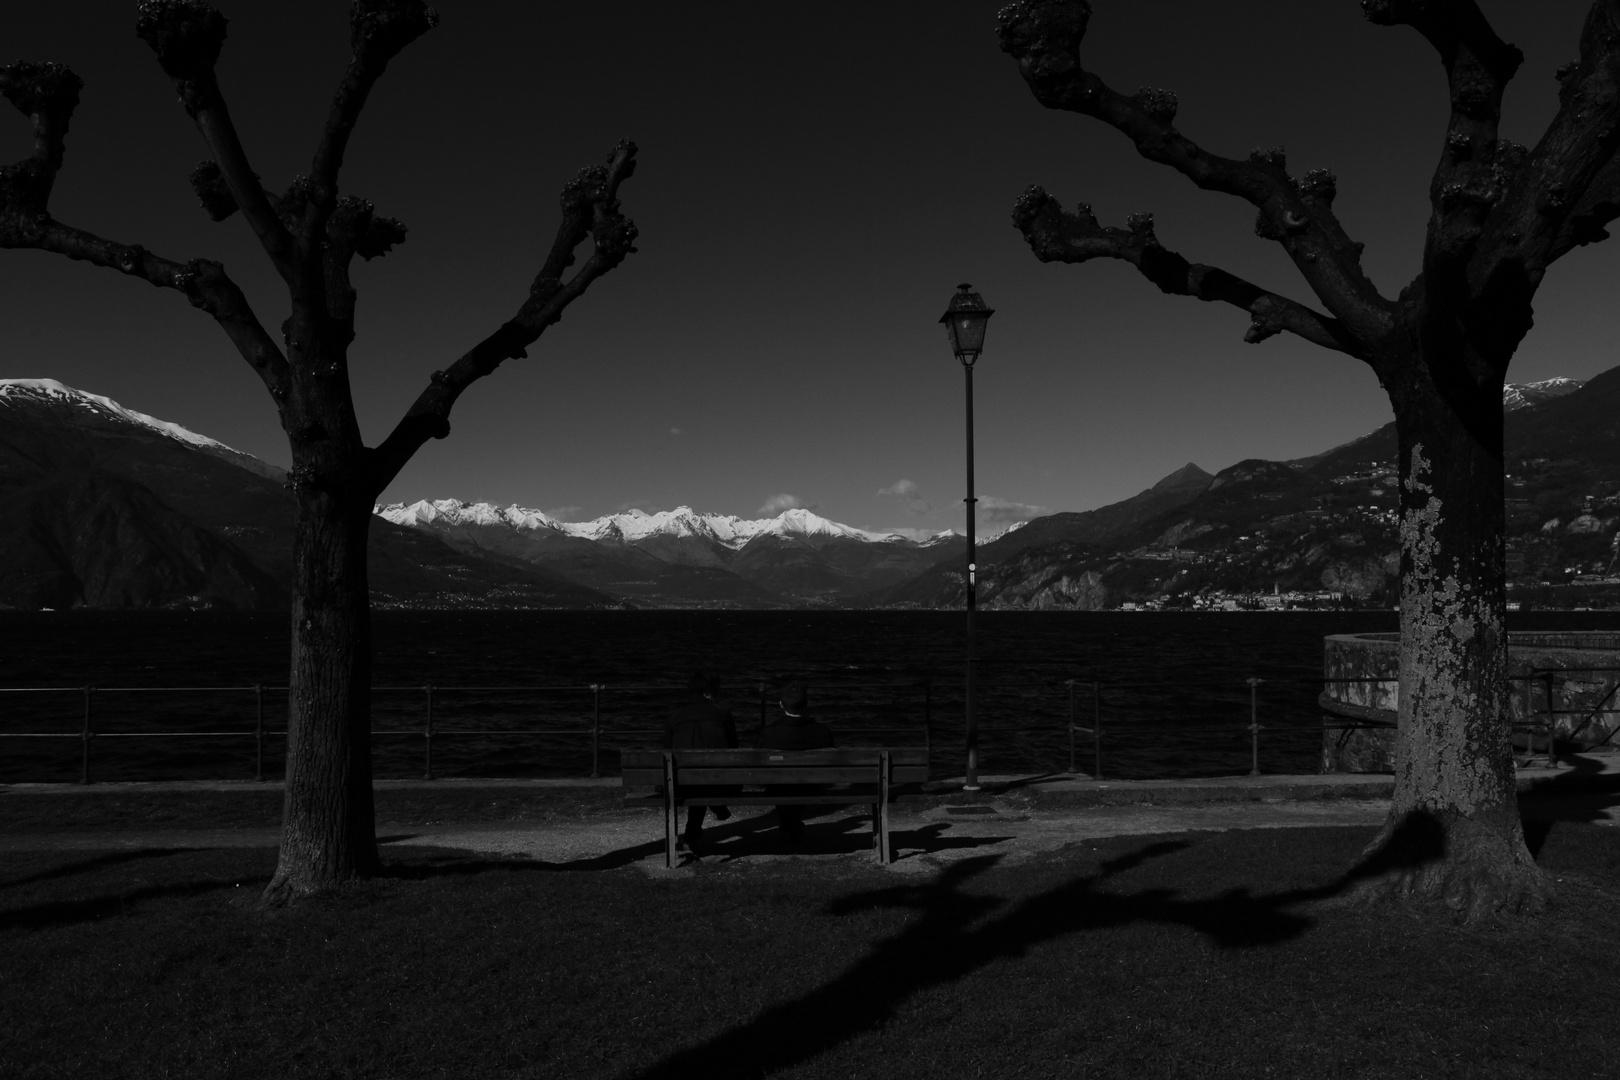 Bellagio - lago di como - spartivento